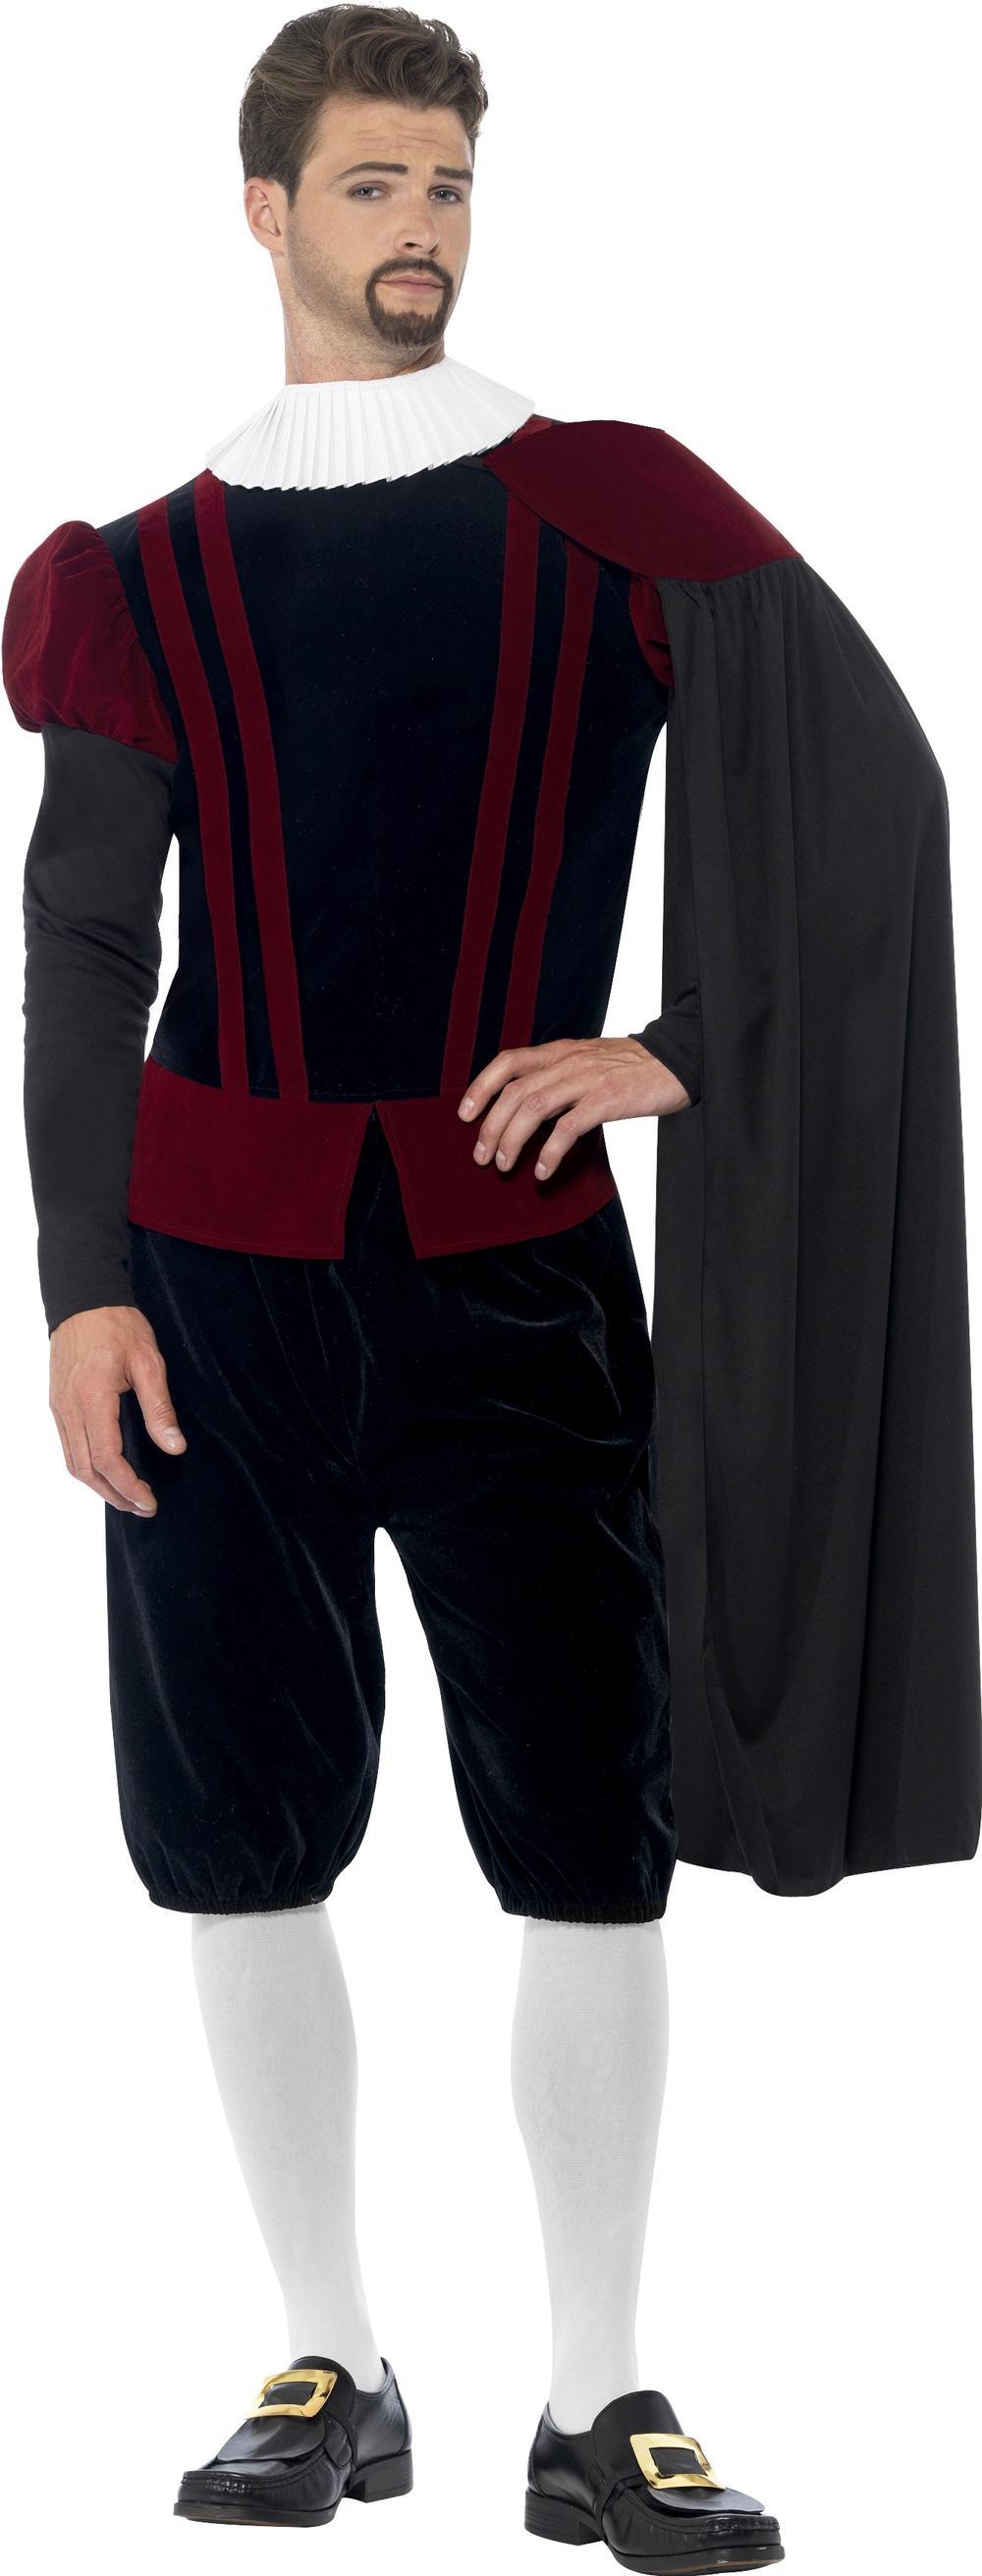 Tudor Lord Mens Fancy Dress Medieval Prince Renaissance Blackadder Adult Costume